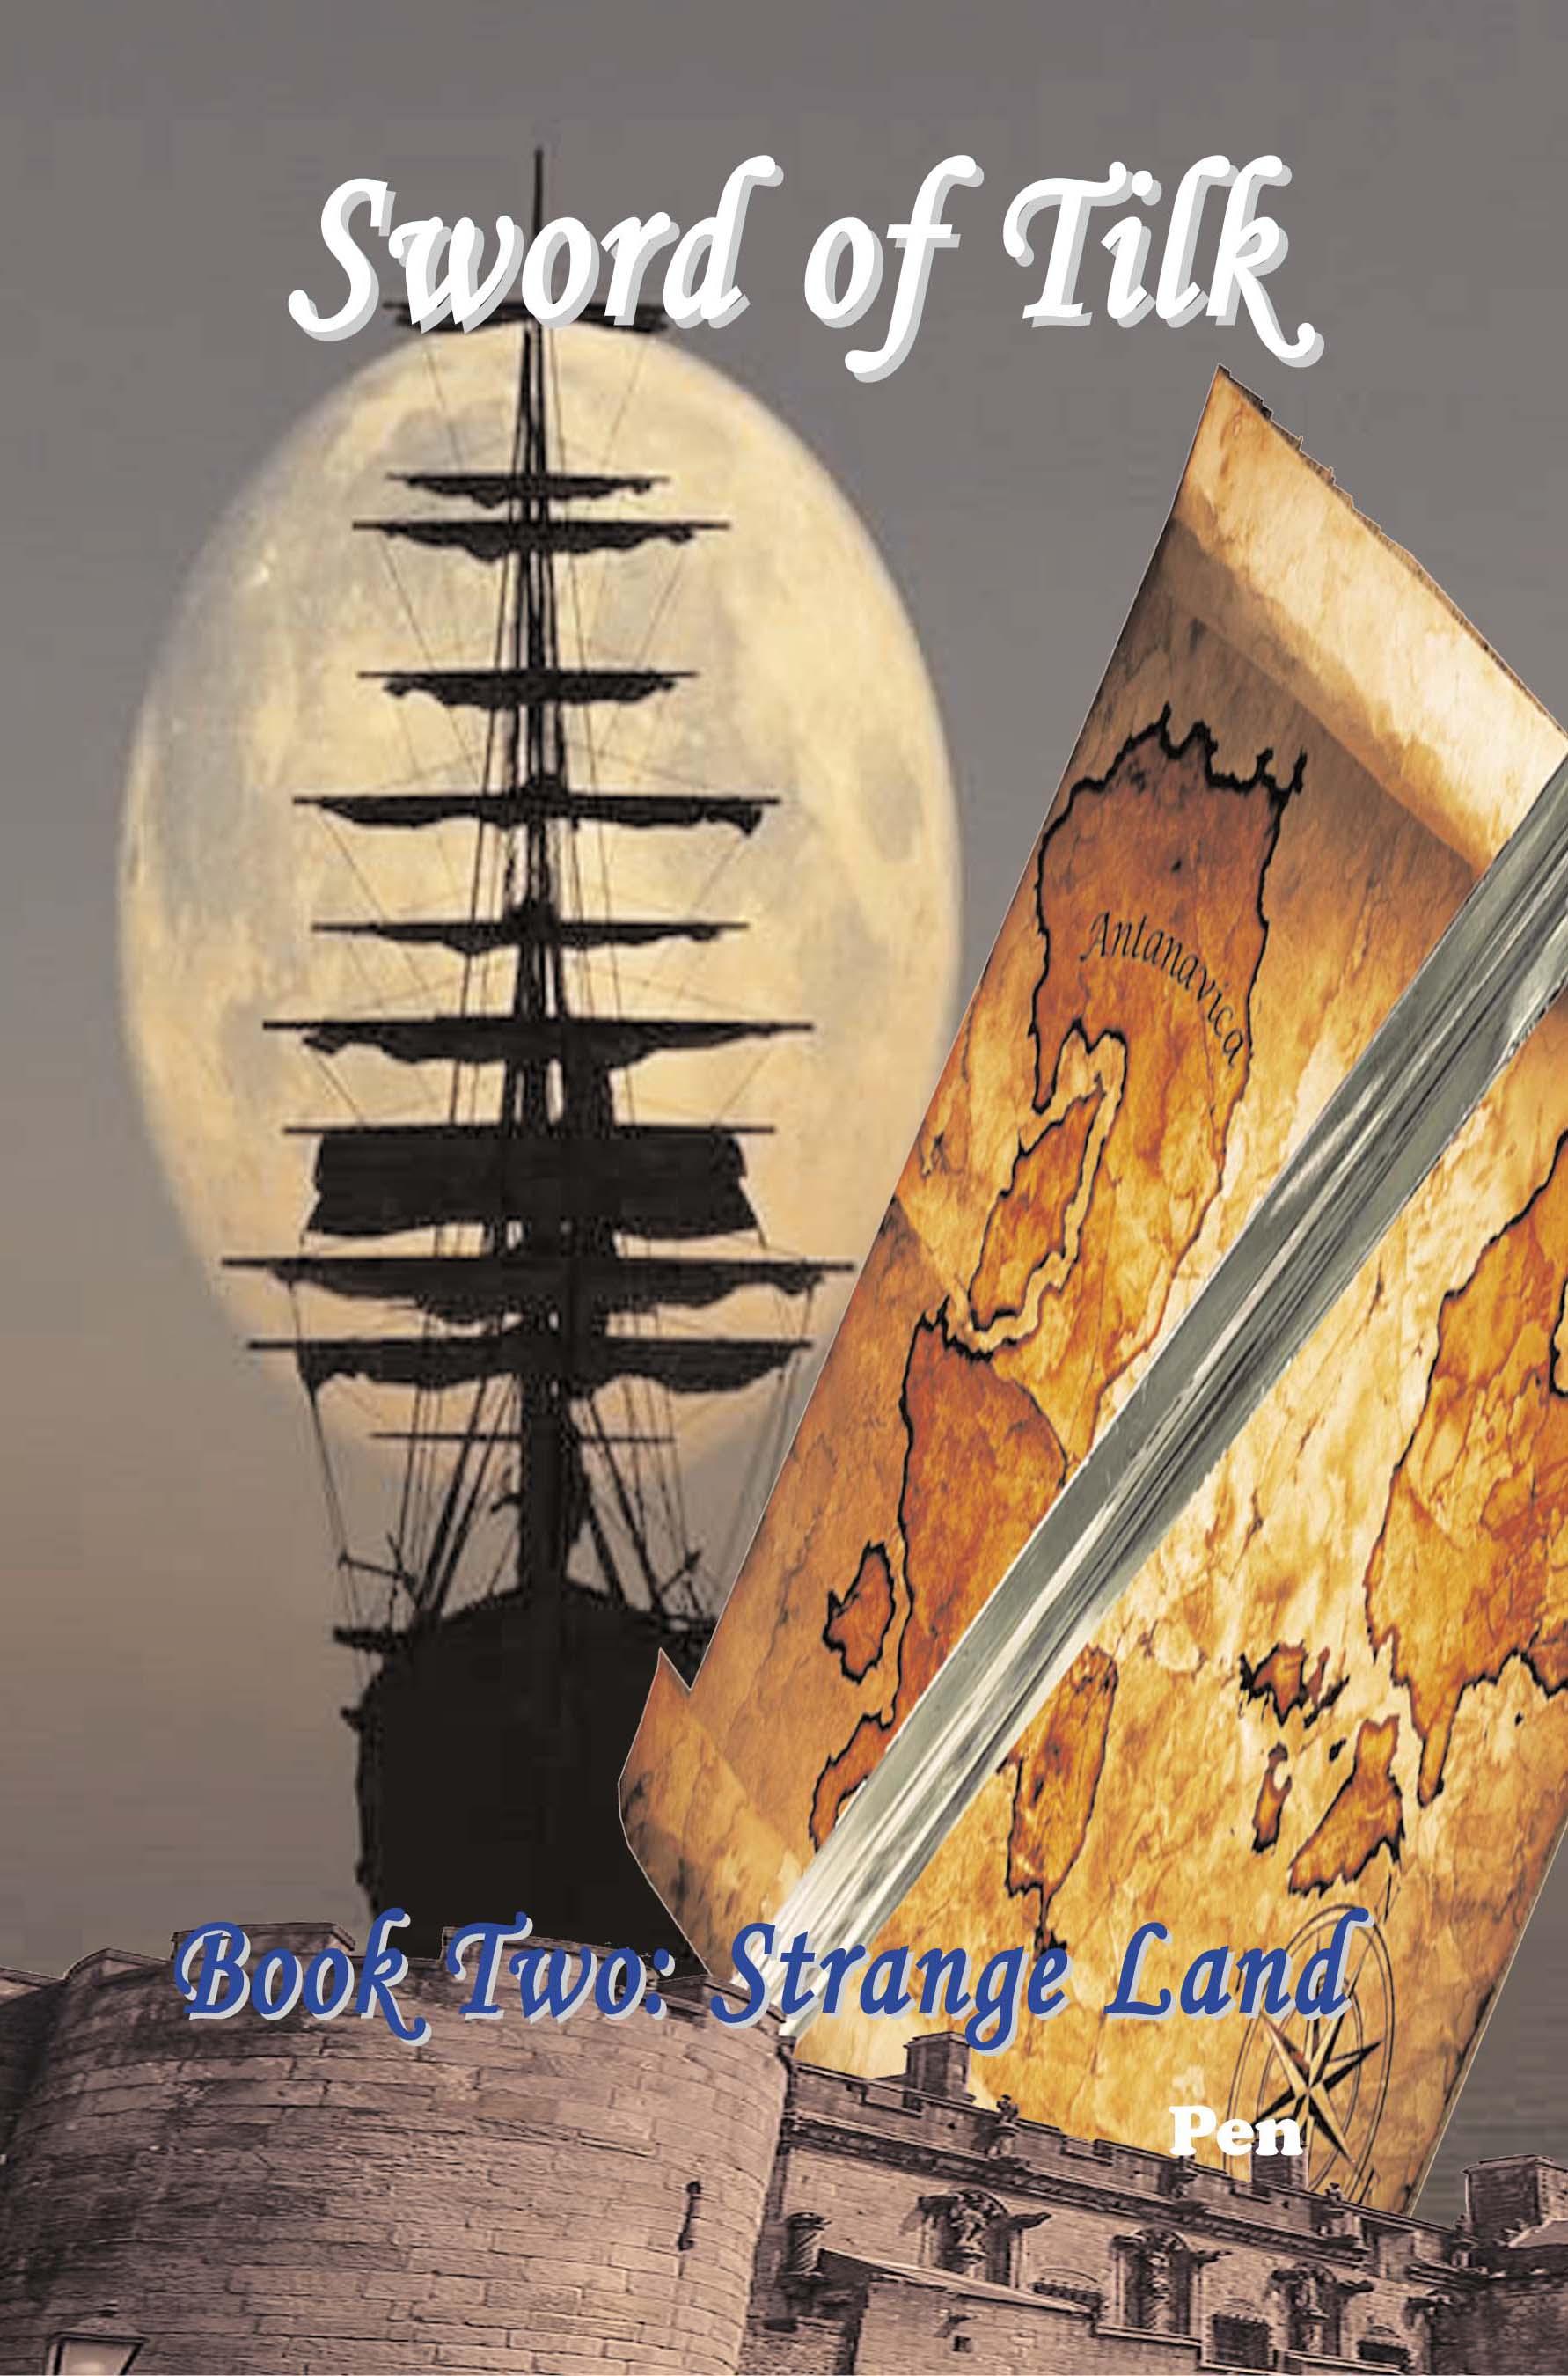 Sword of Tilk: Book Two: Strange Land